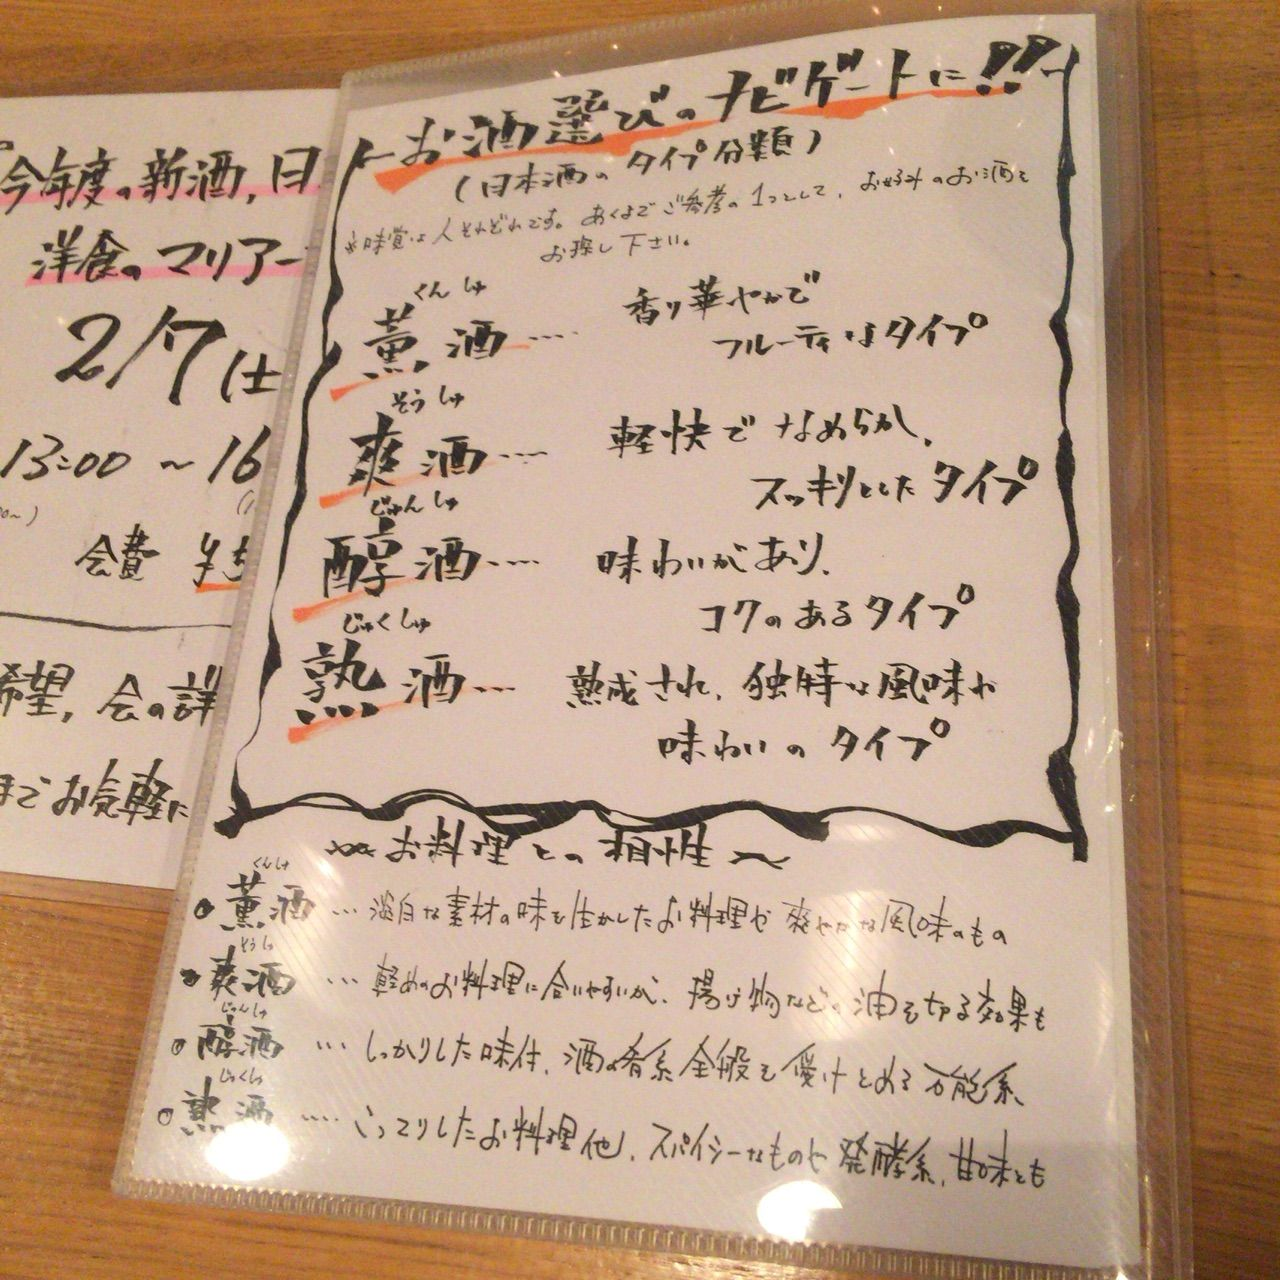 2015-01-23-20-59-31